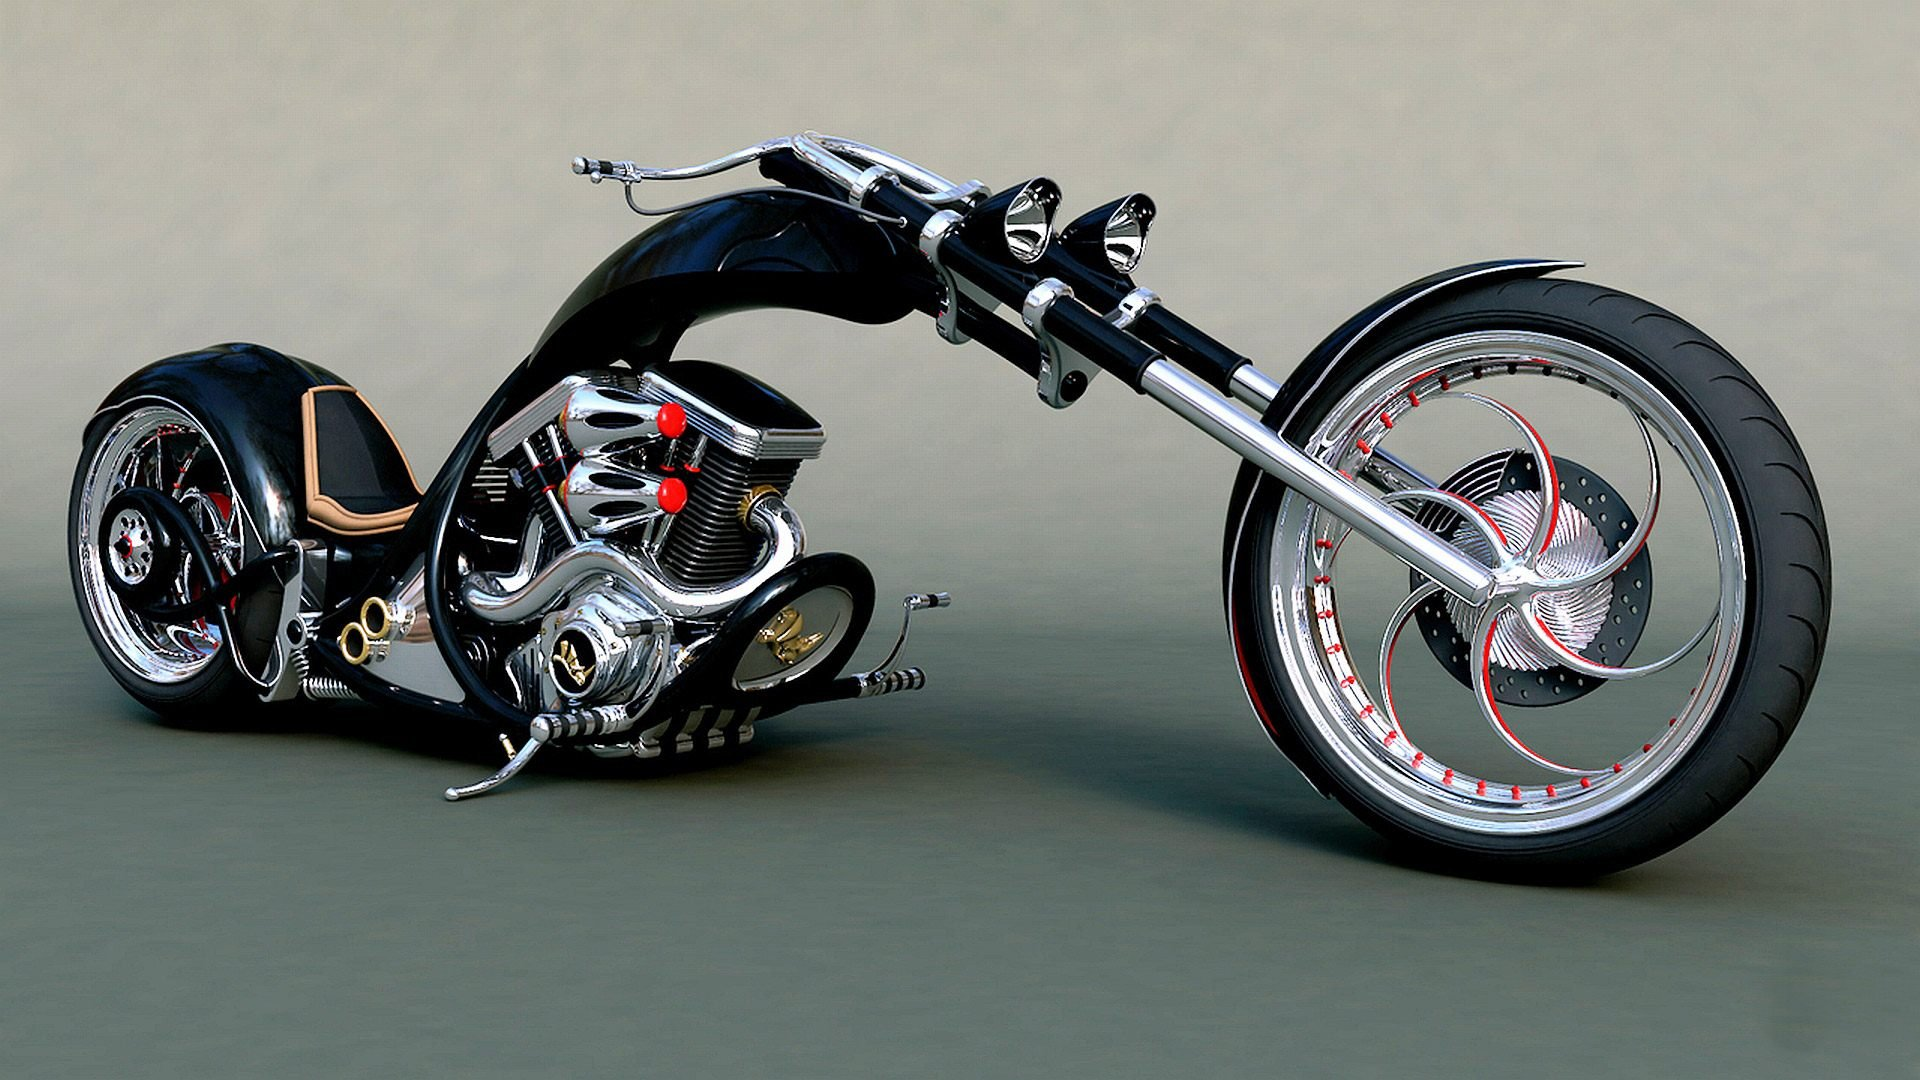 tuning motorbike motorcycle hot rod rods custom wallpaper background 1920x1080